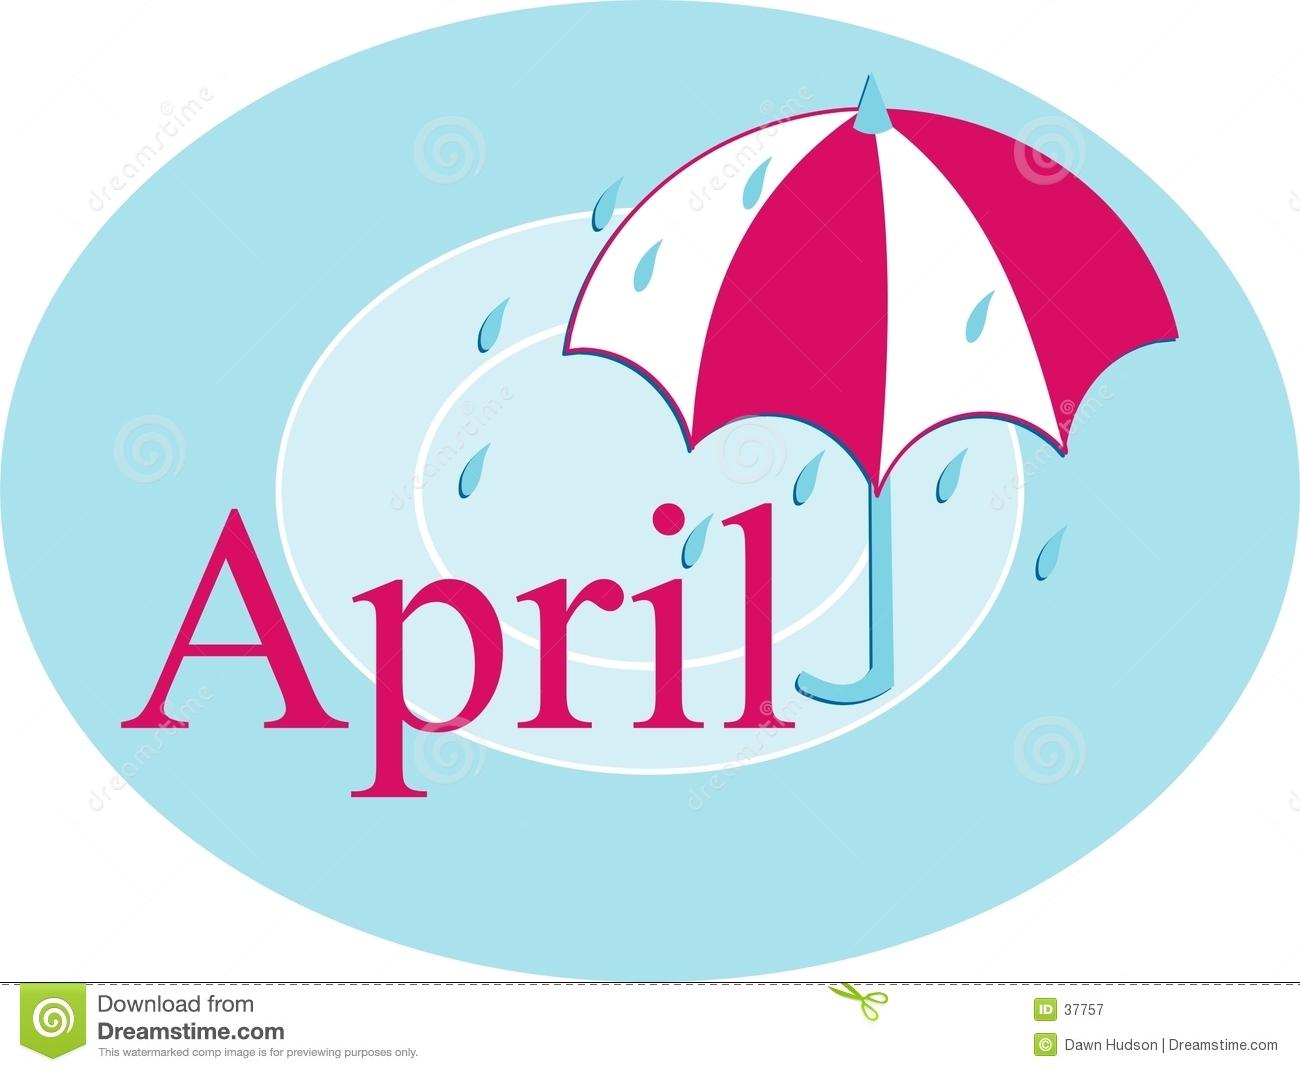 April showers calendar clipart image royalty free stock April Showers Stock Photos, Images, & Pictures - 231 Images image royalty free stock